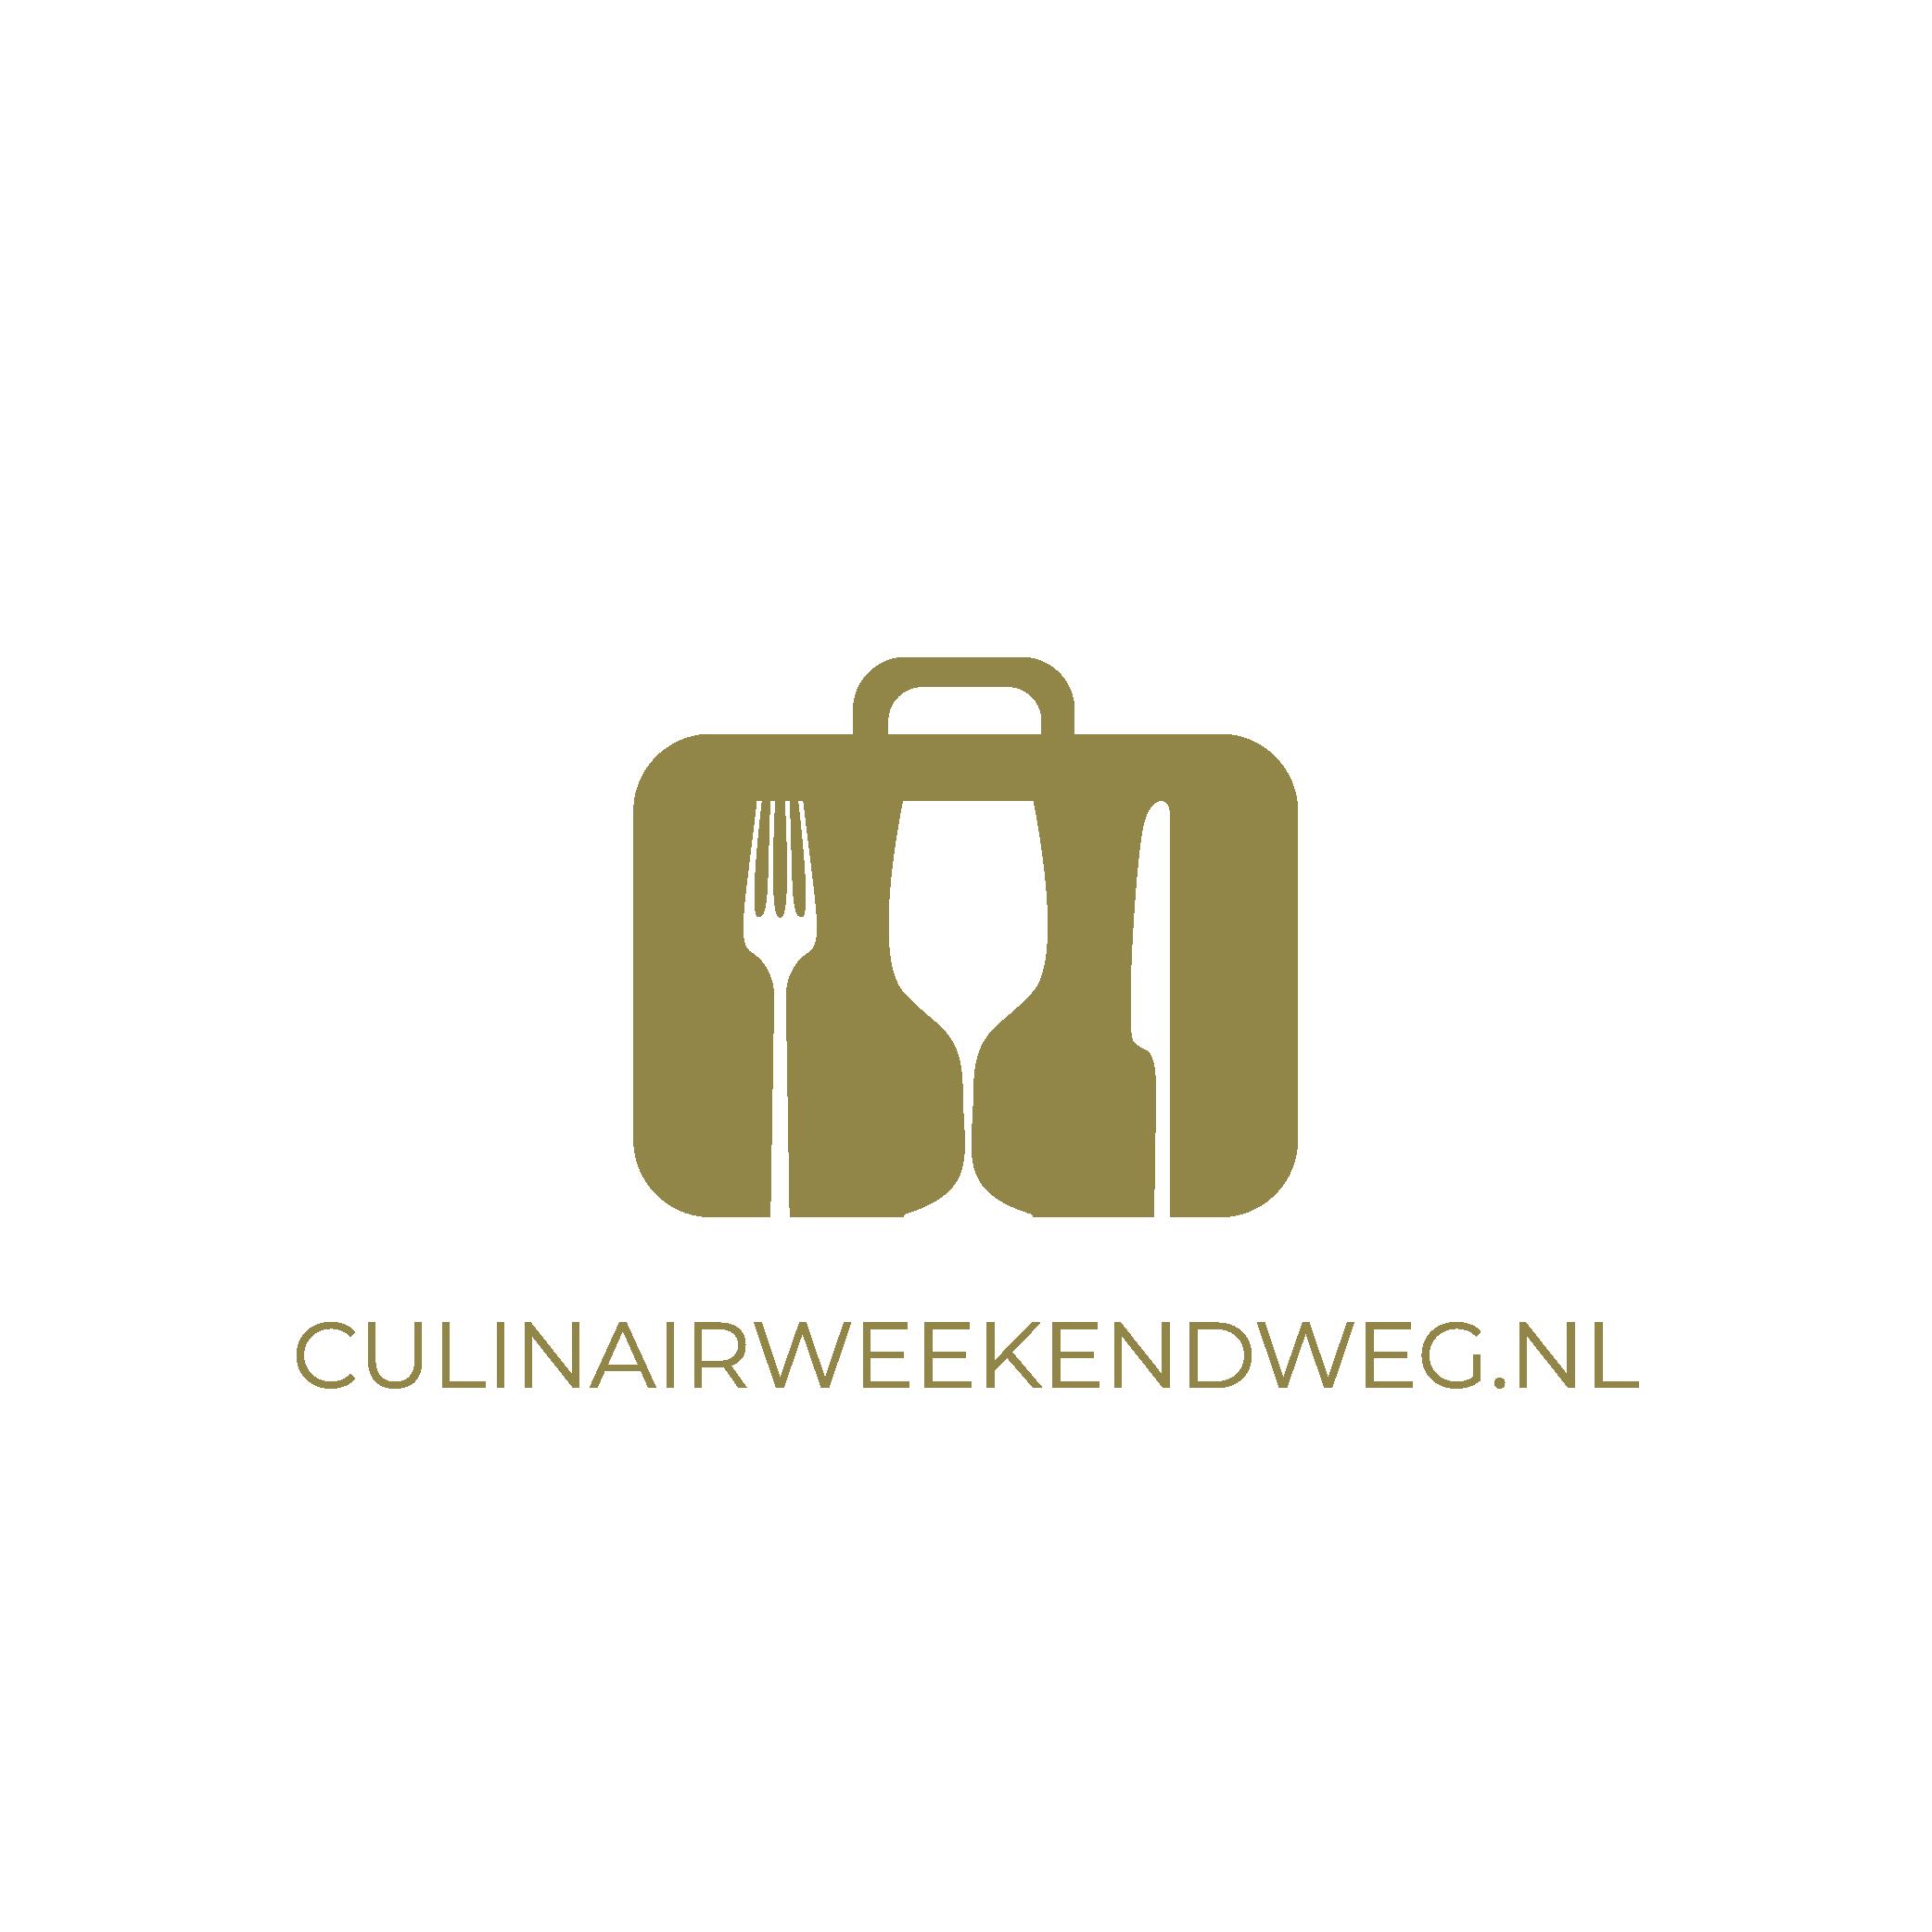 culinair weekend weg logo